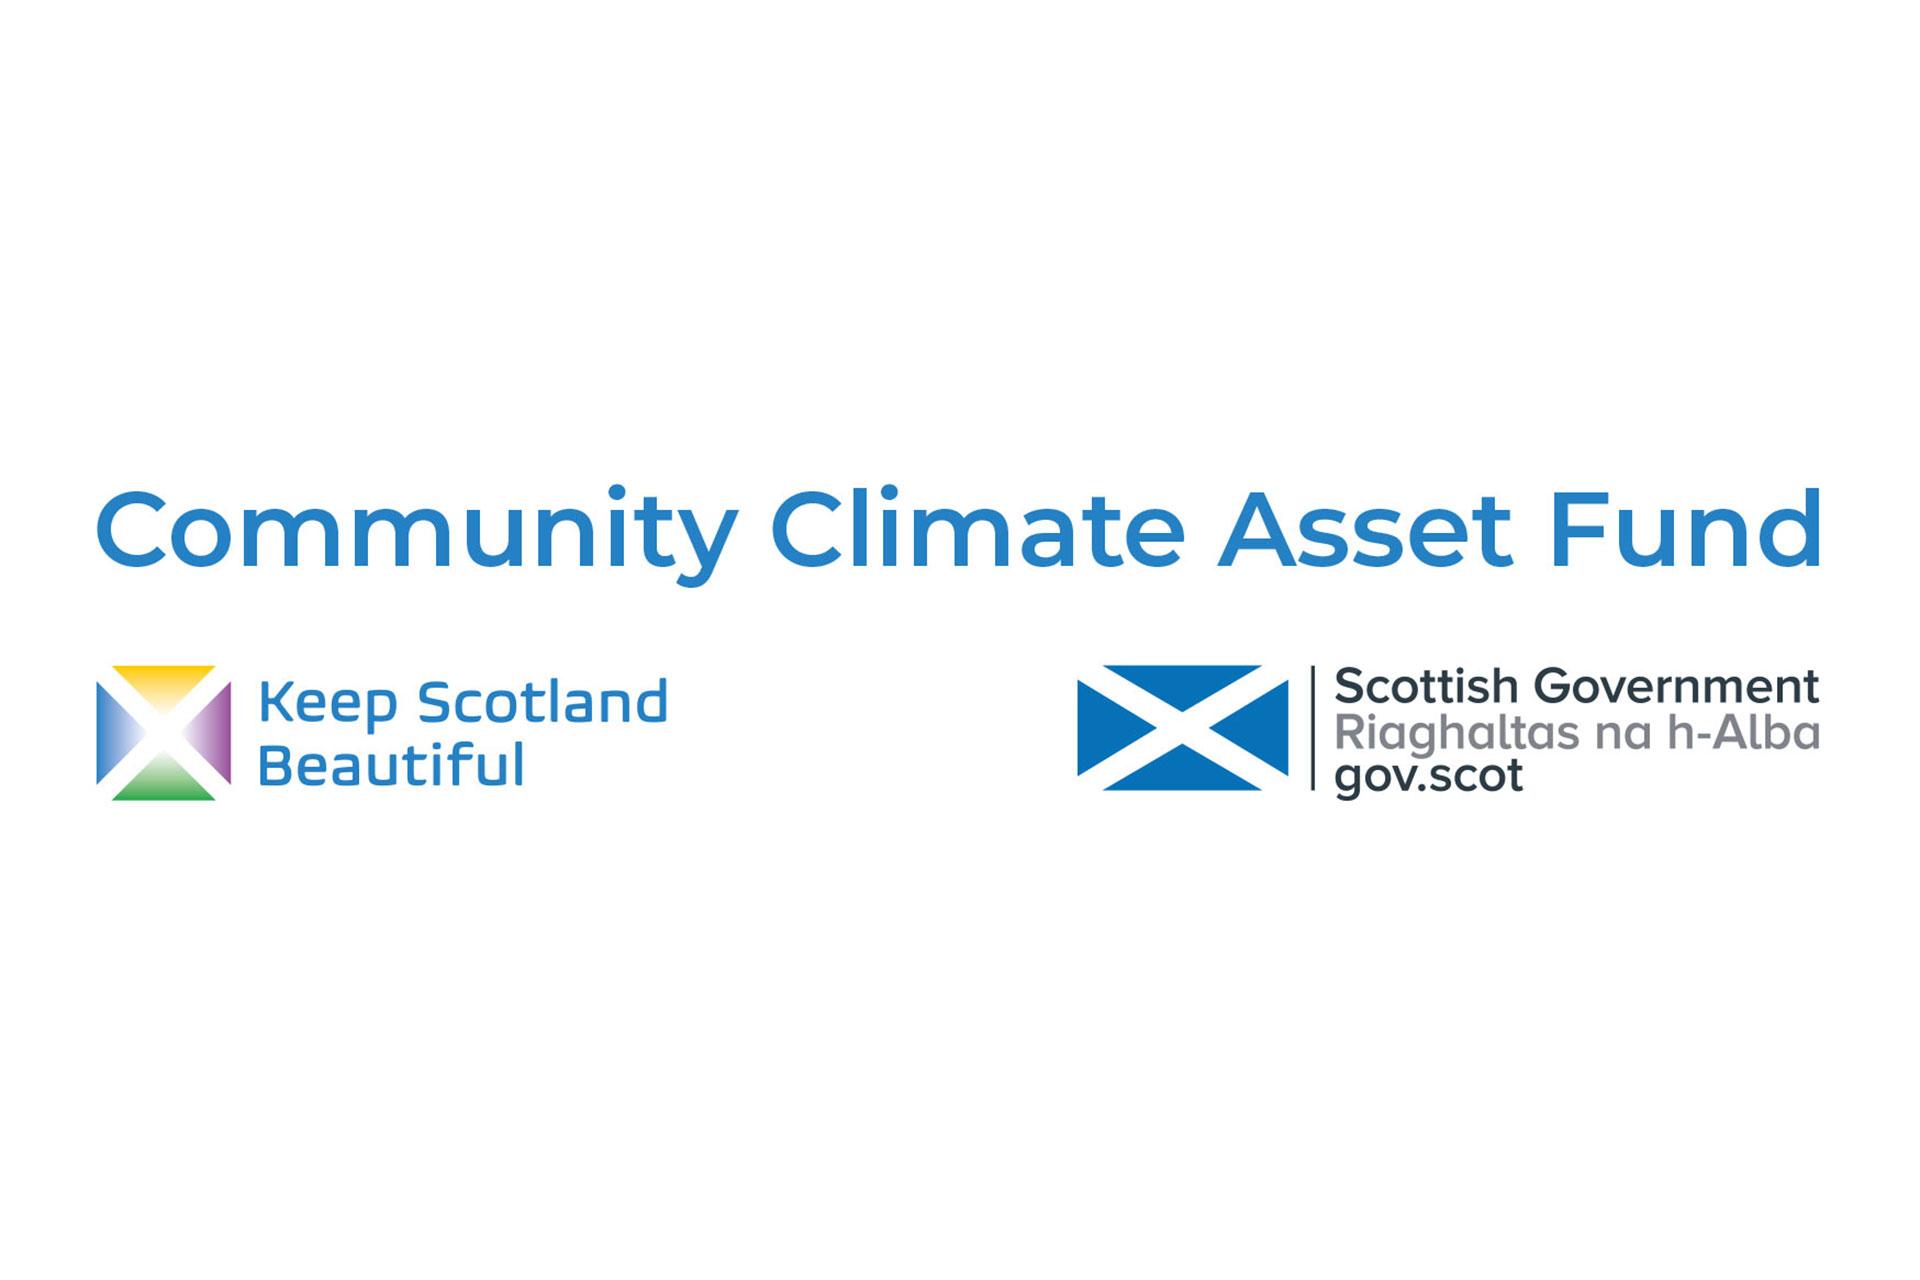 Community asset fund logo